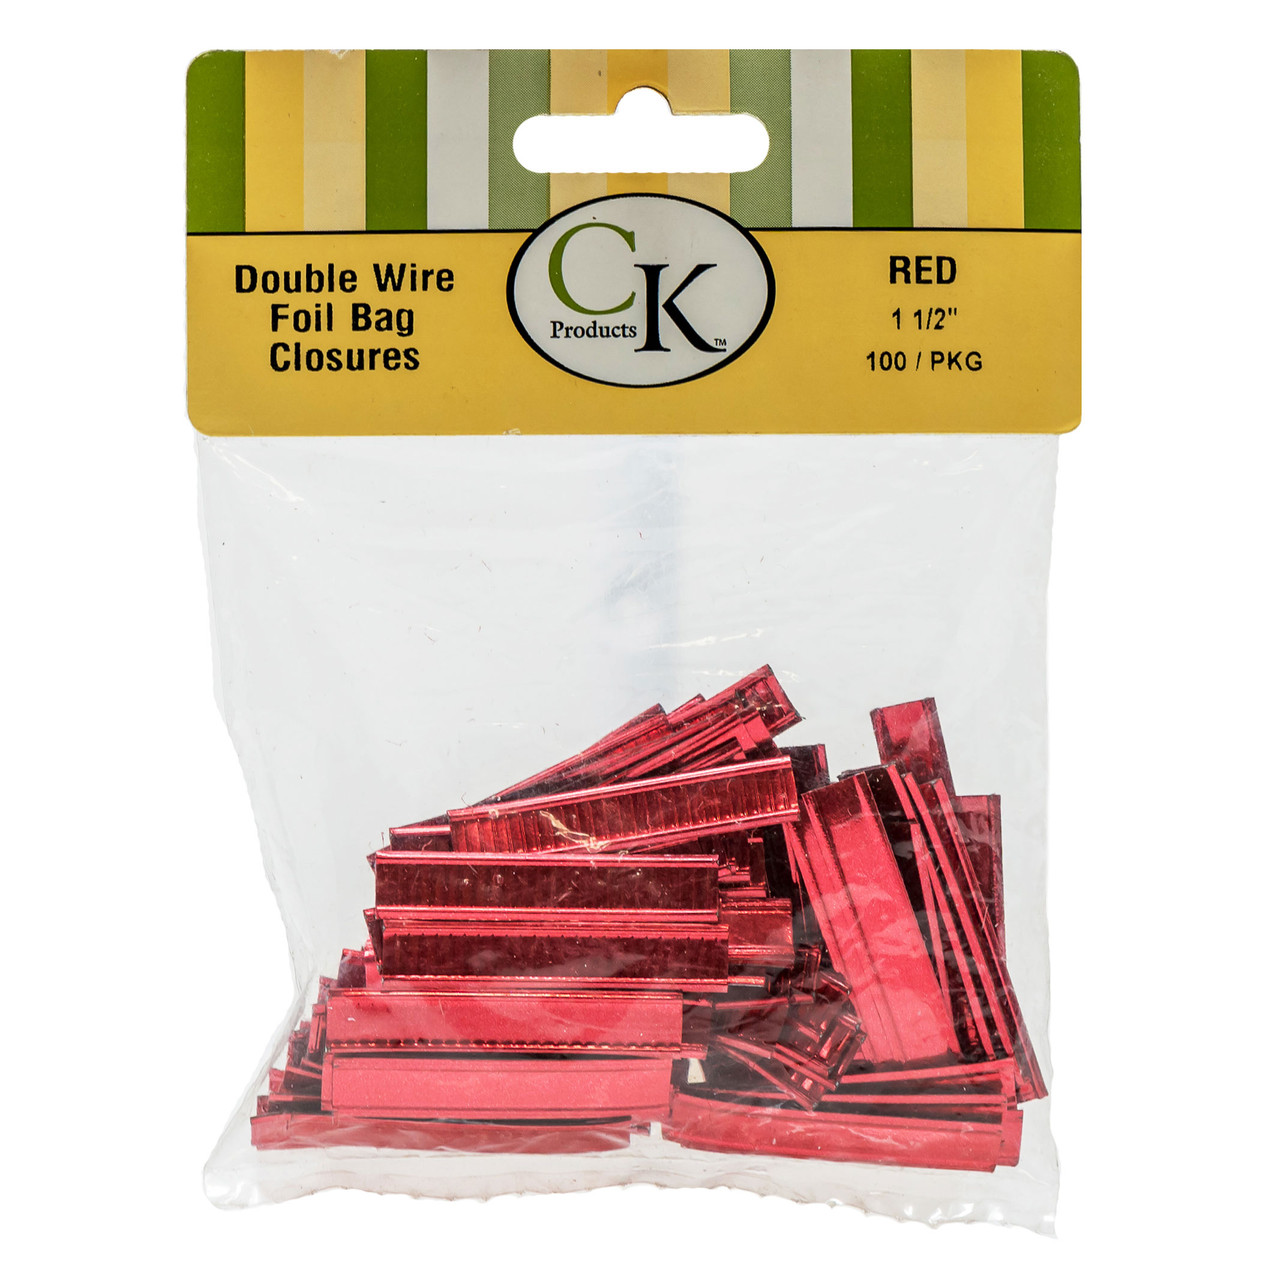 Red folded bag closures